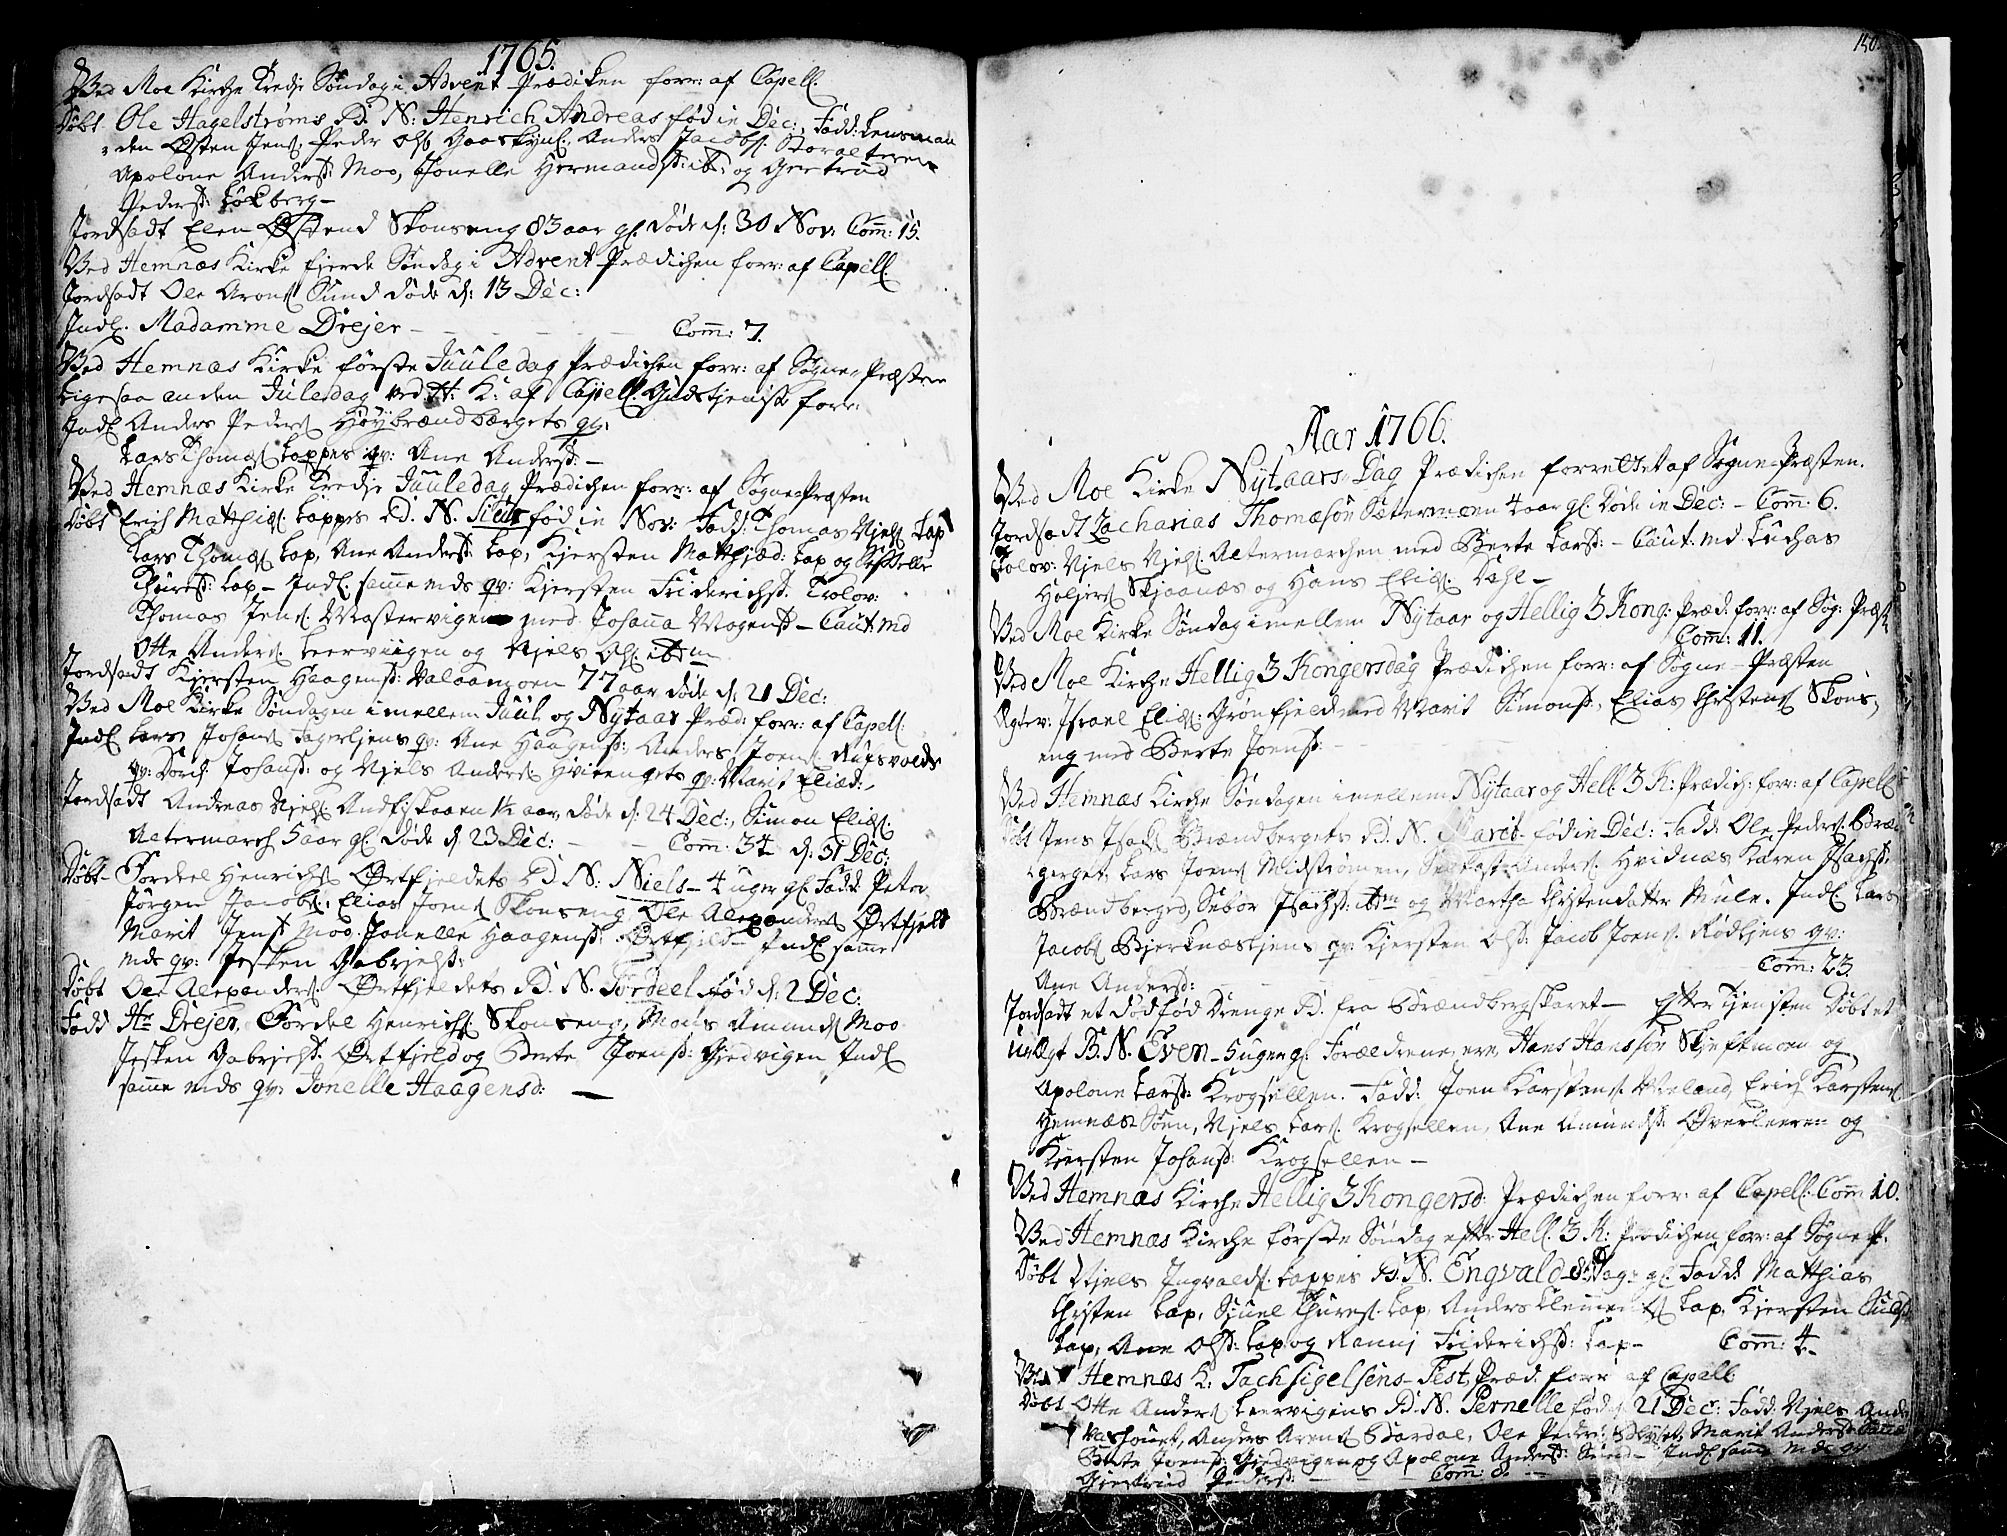 SAT, Ministerialprotokoller, klokkerbøker og fødselsregistre - Nordland, 825/L0348: Ministerialbok nr. 825A04, 1752-1788, s. 150